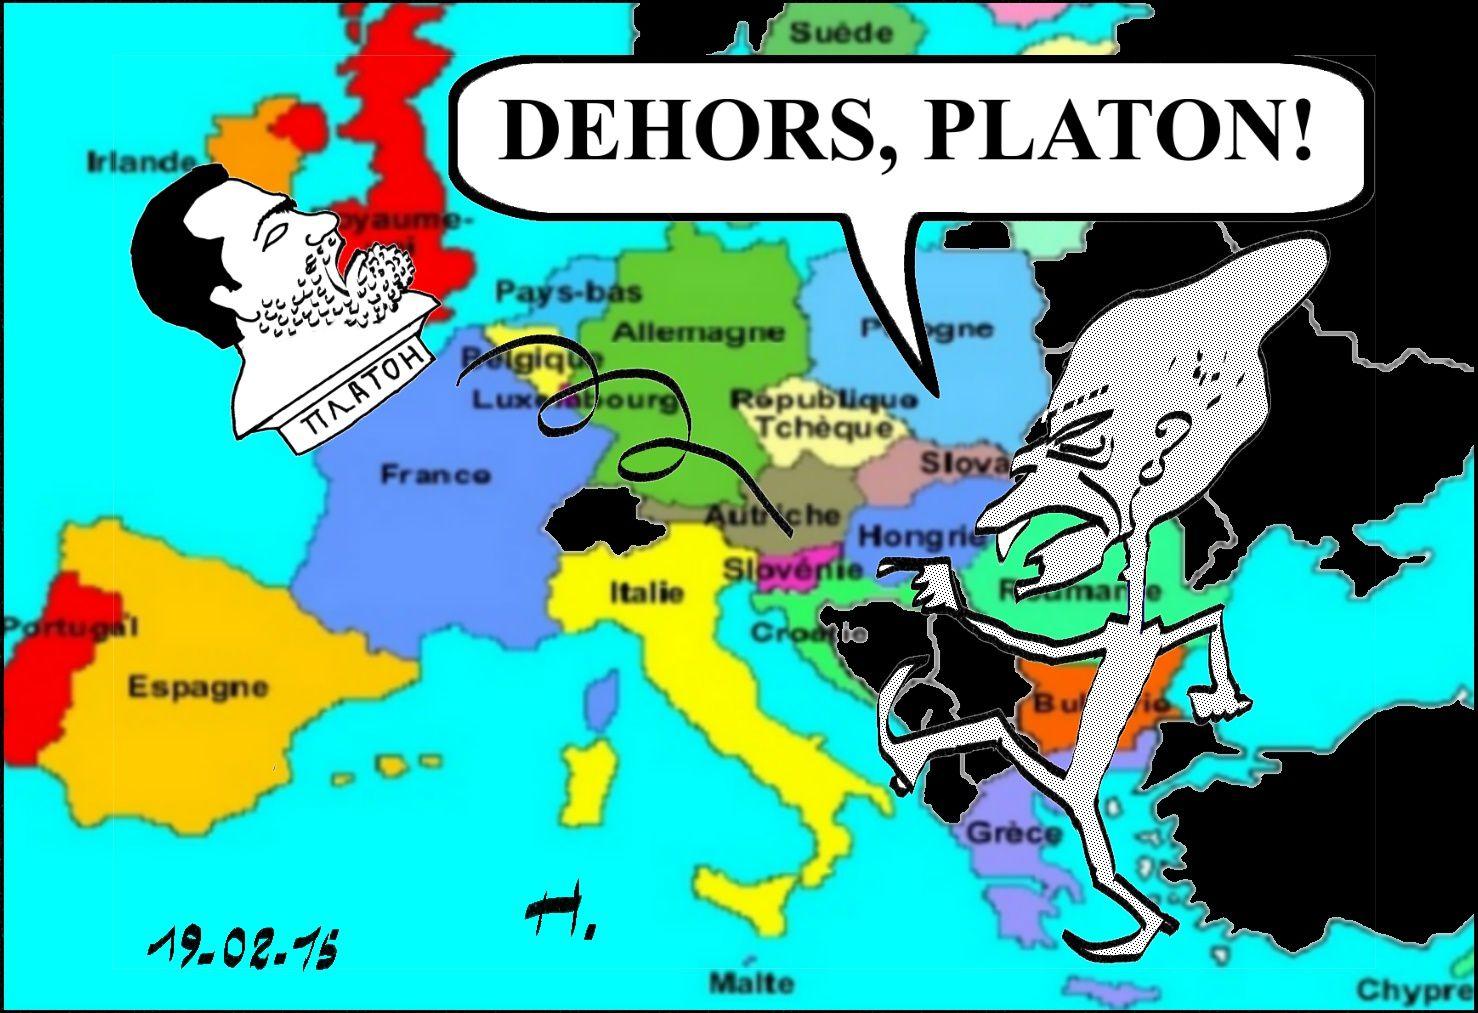 Dehors, Platon